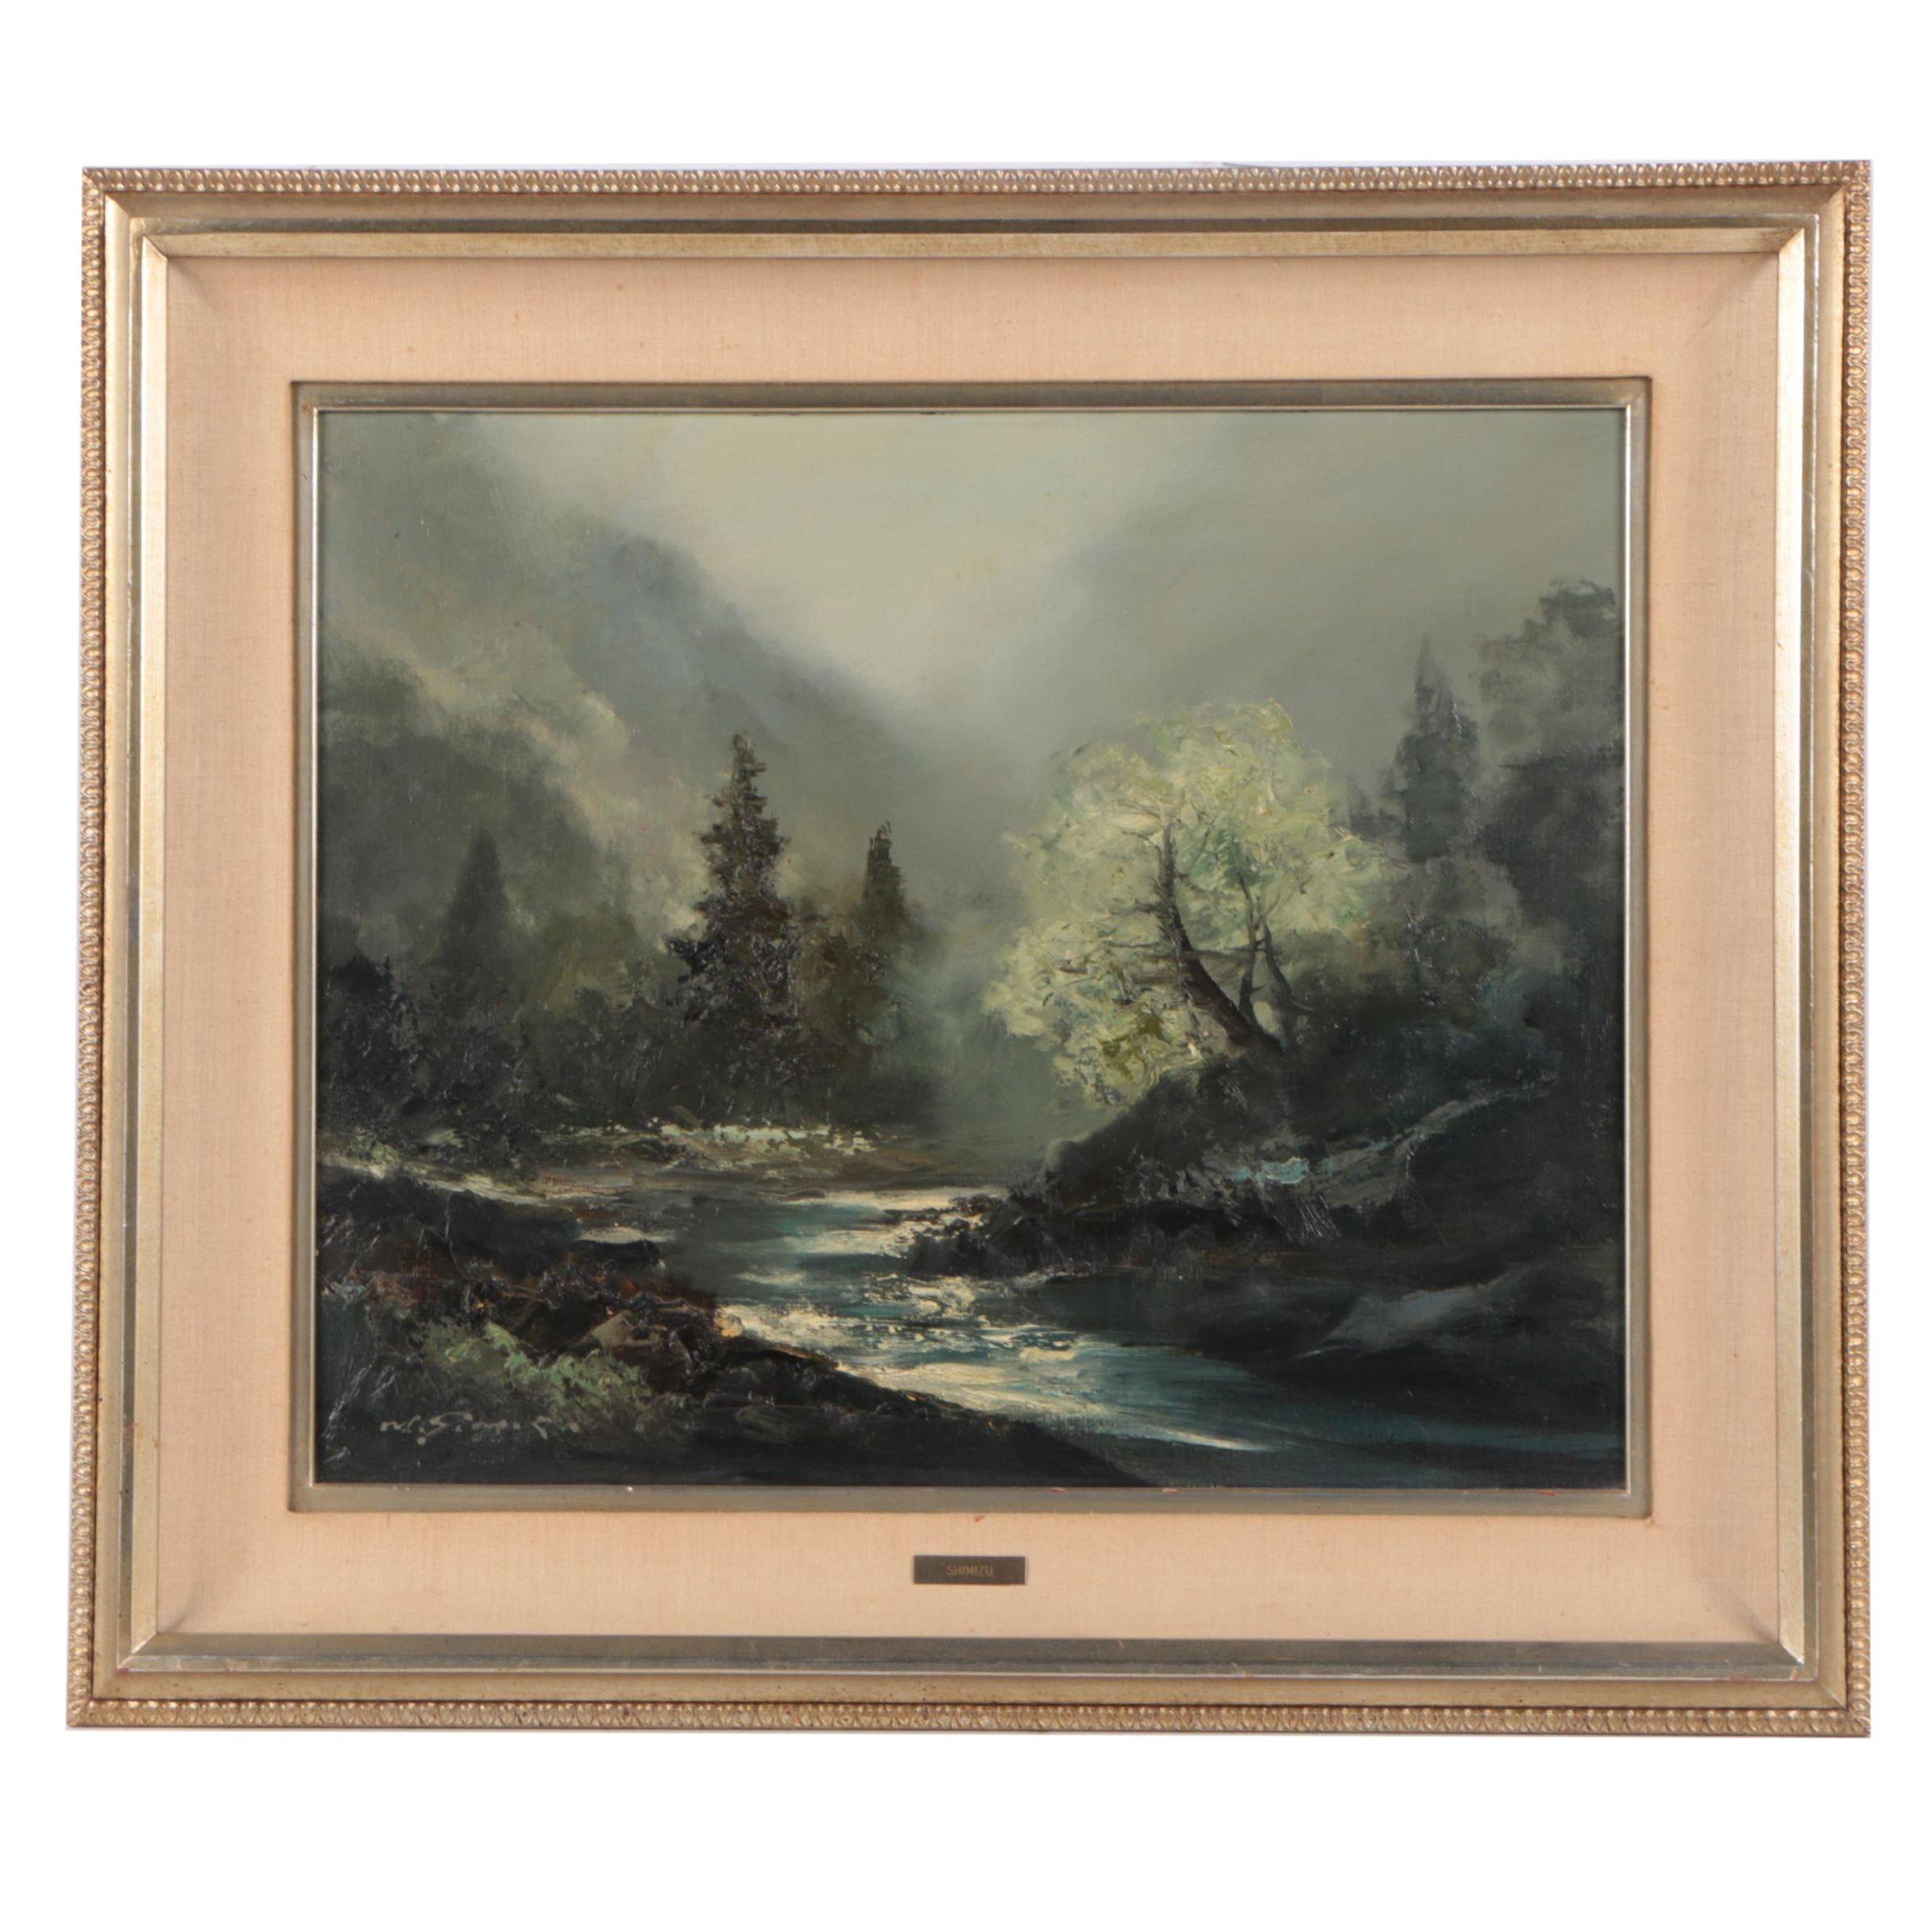 Mitsuzo Shimizu Oil on Canvas Landscape Painting